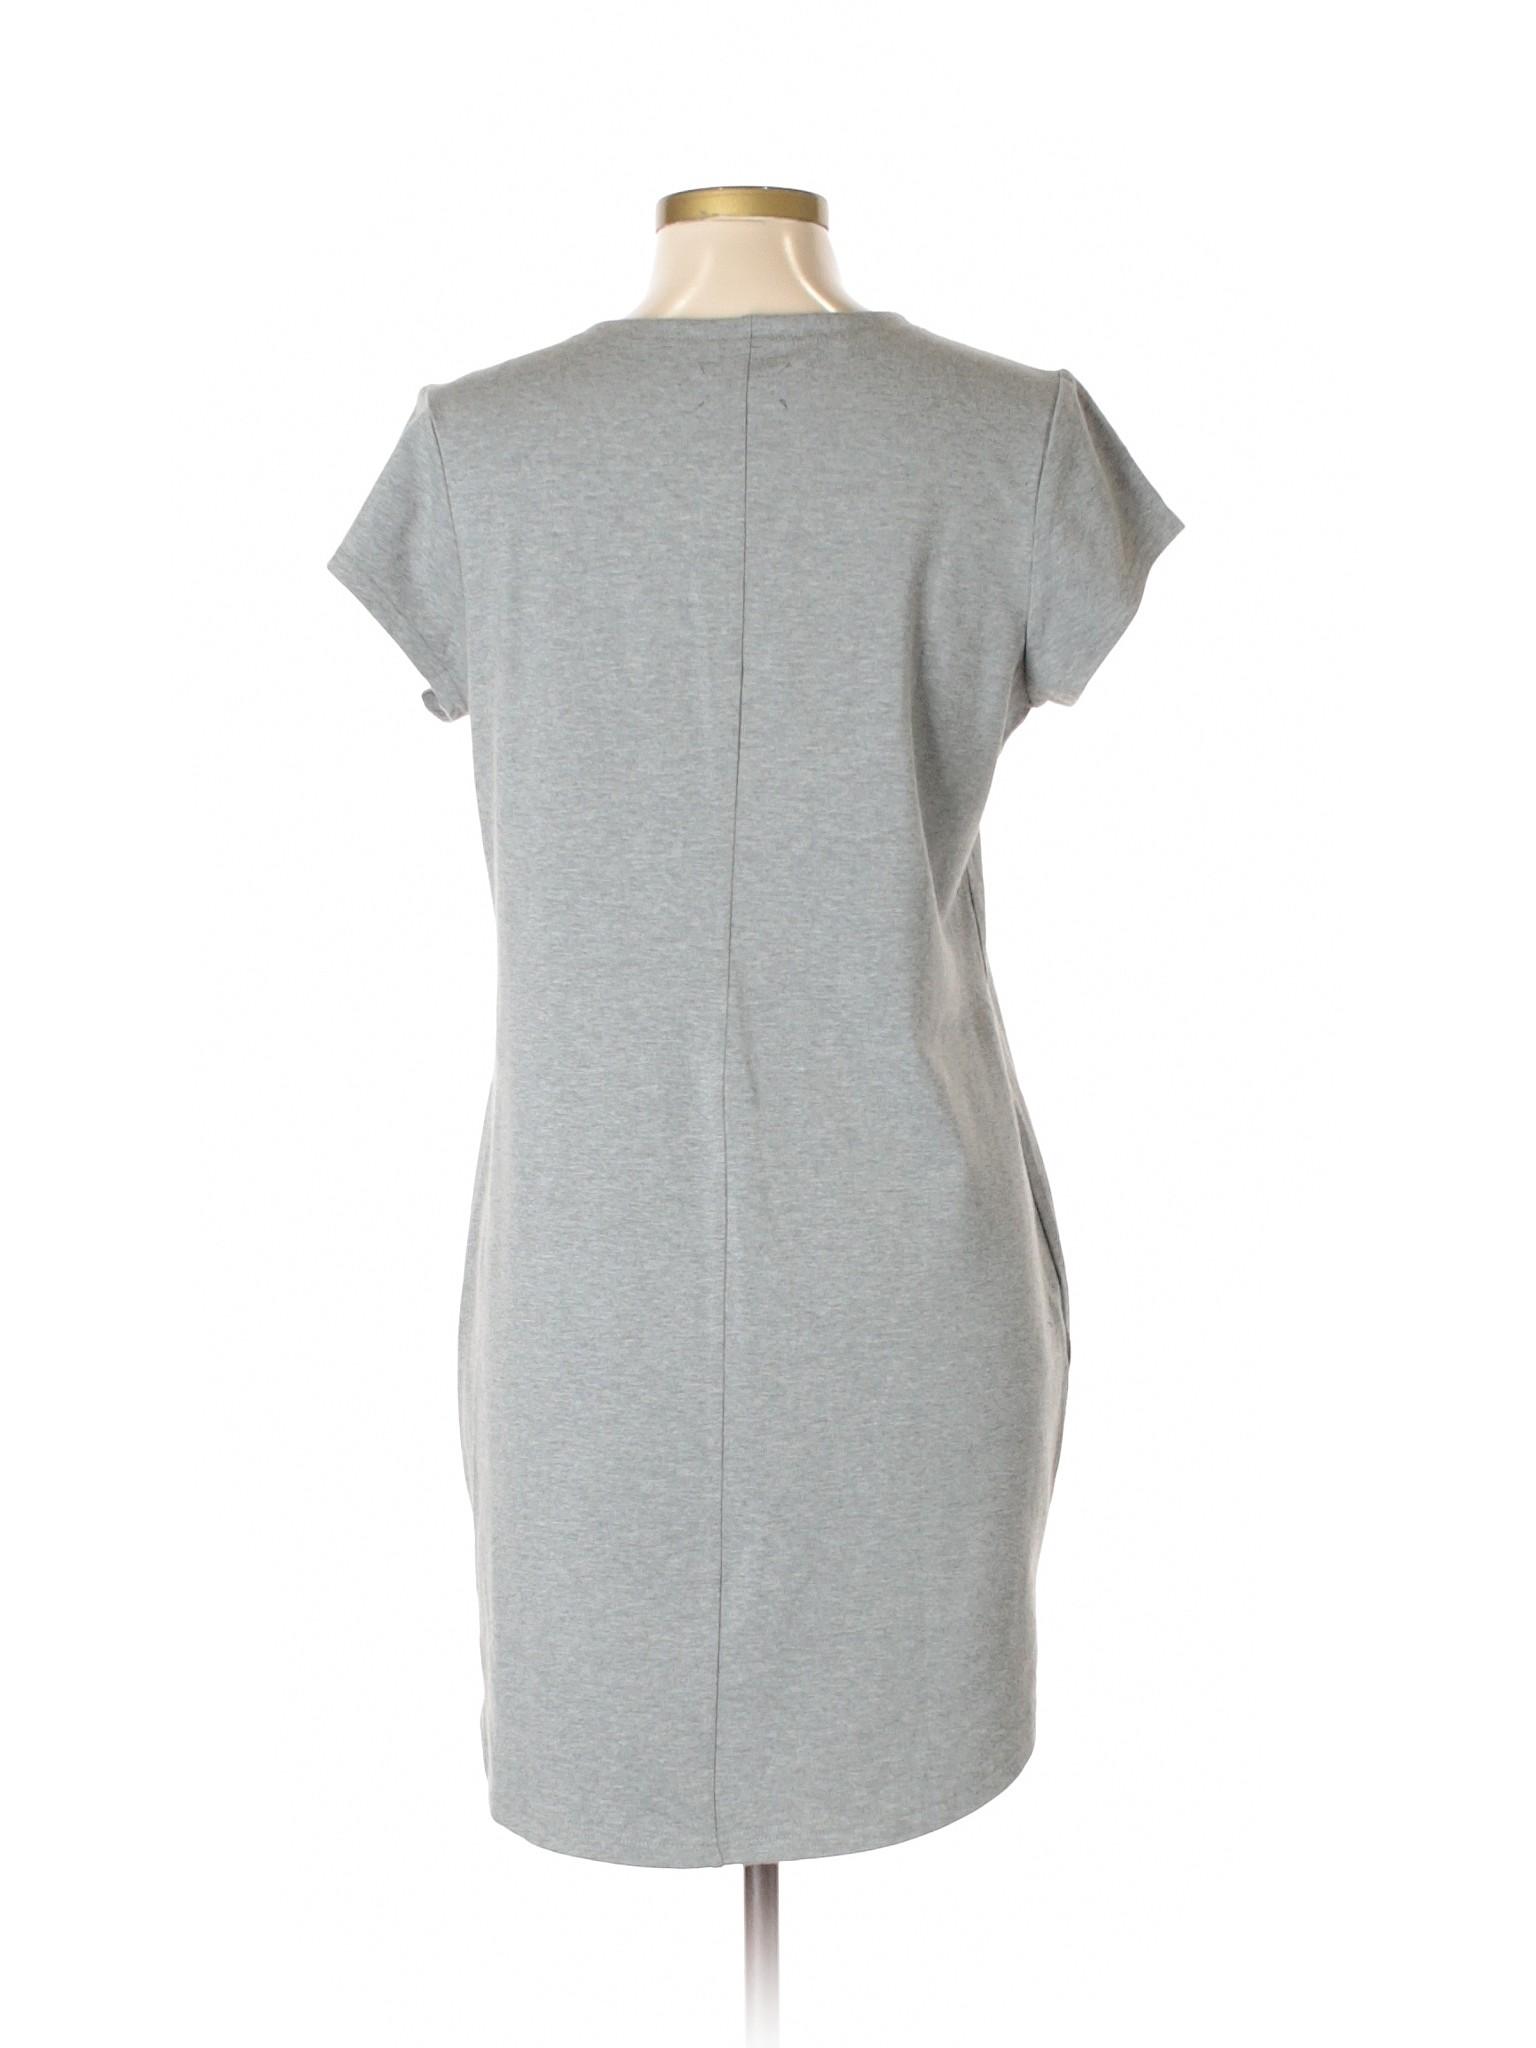 Dress winter Casual Lou Boutique Grey amp; 7xXW6q